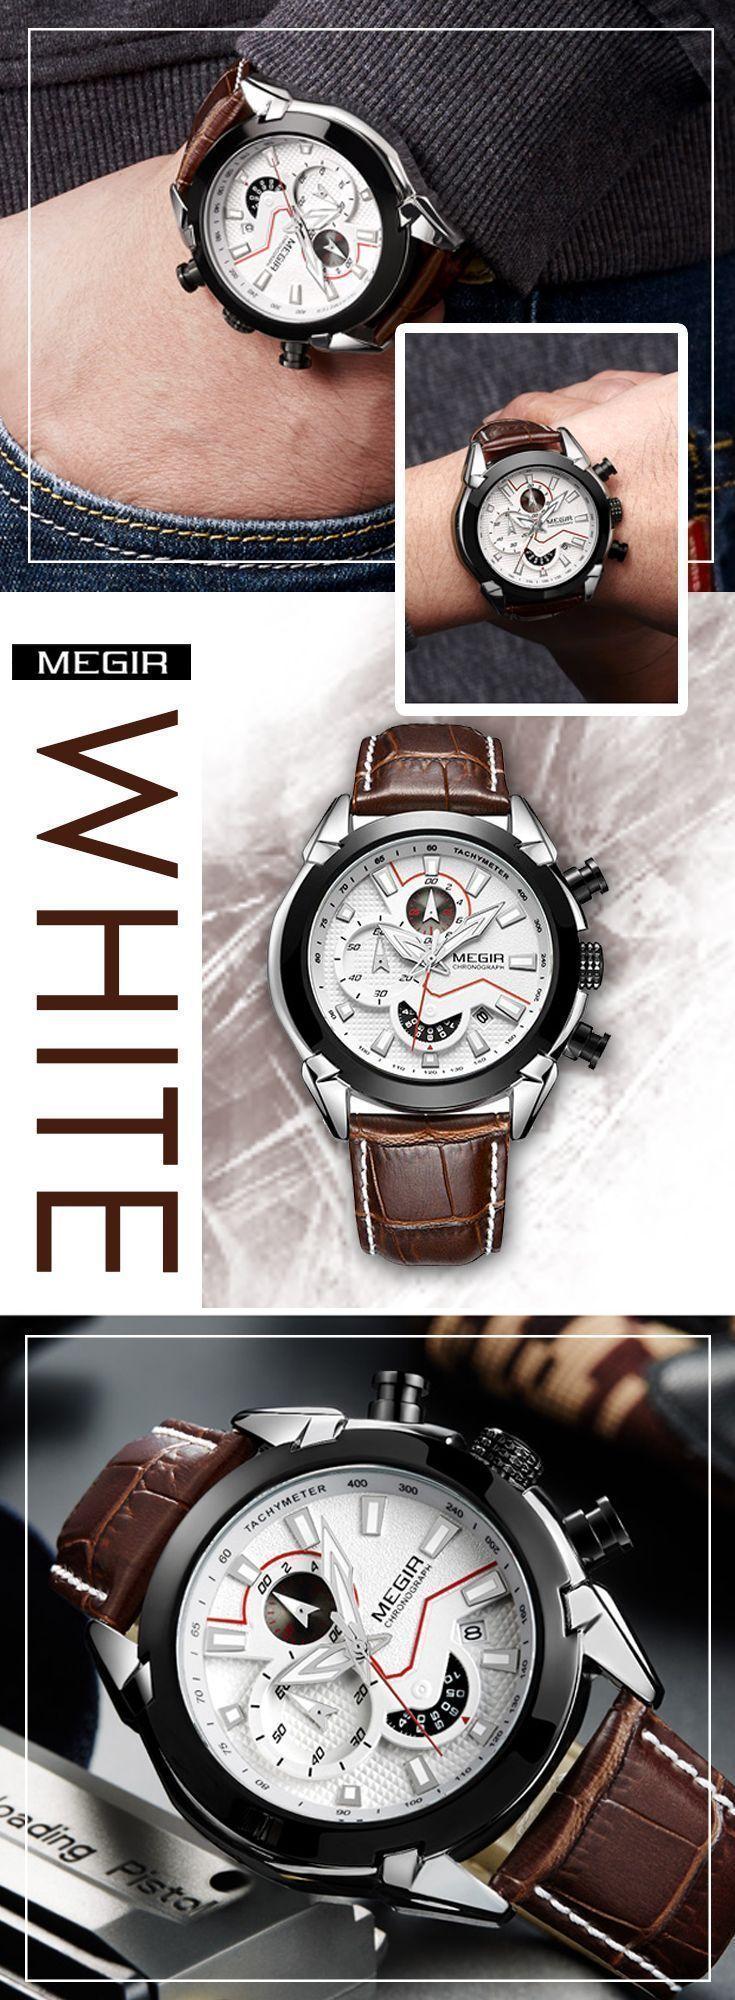 Men's luxury sport watches - Megir 2065 Leather band watch timepiece chronograph - men's top brand style affordable fashion accessories #menswatch #leatherwatch #watches #menswatchesleather #menswatchesfashion #menaccessories